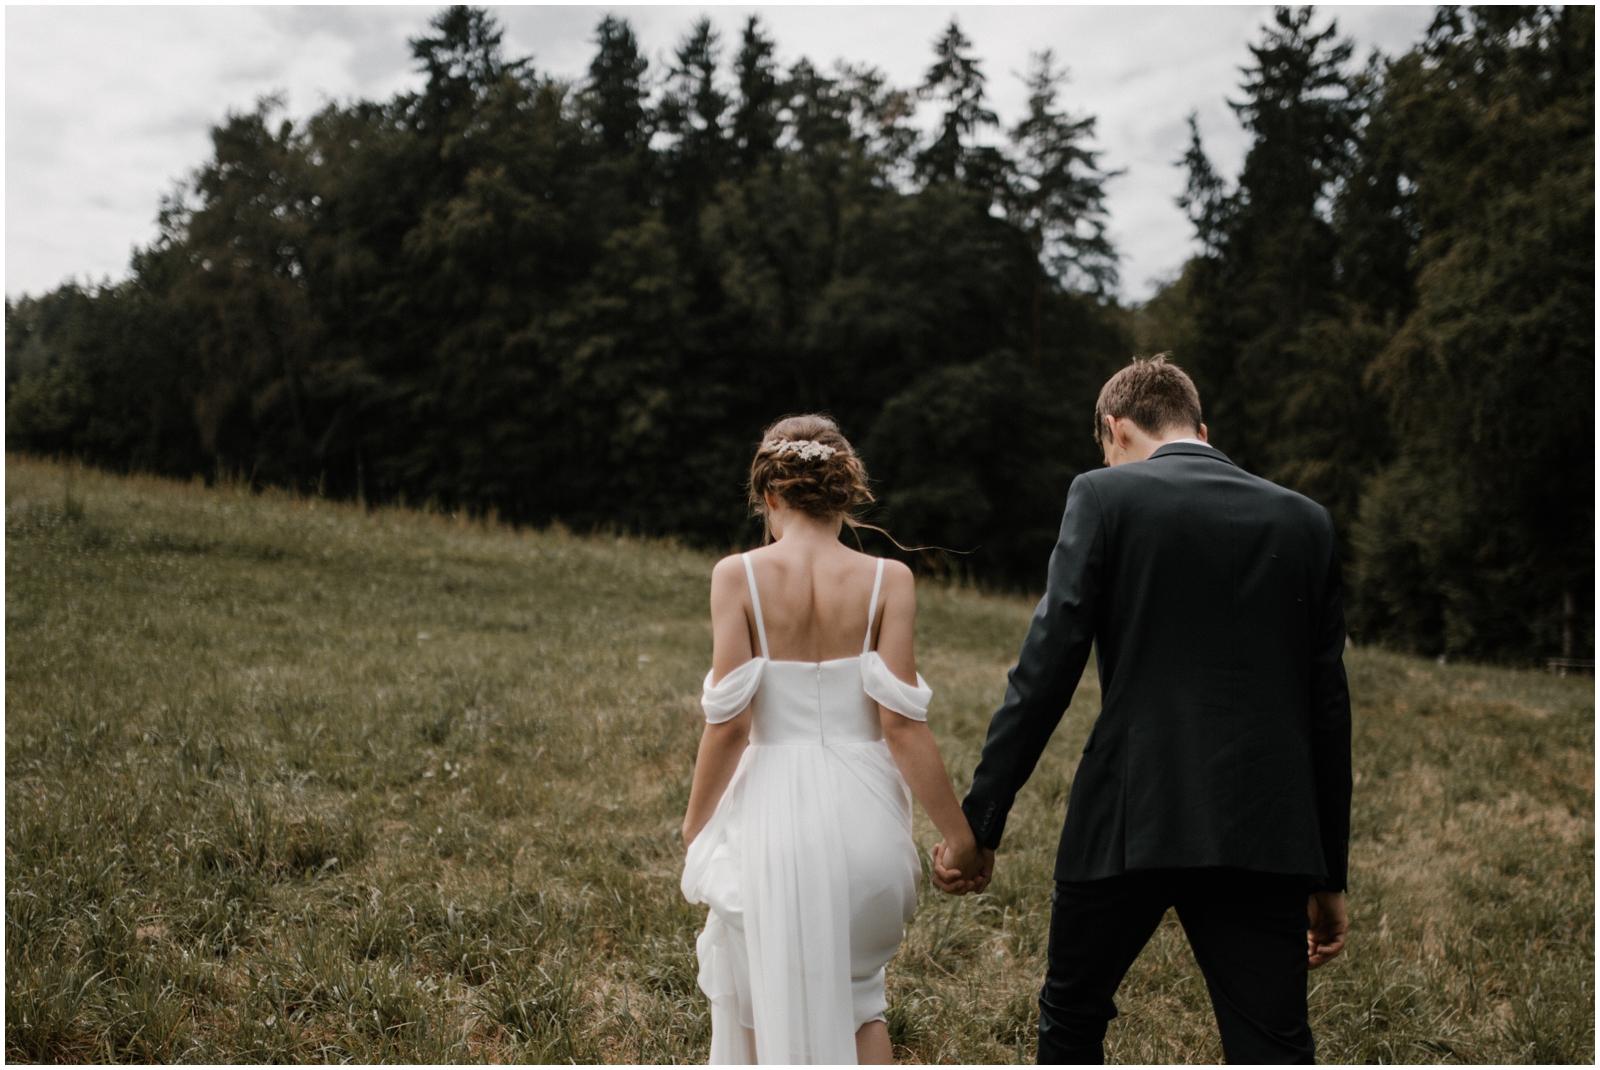 mirjam_thomas_wedding-141.jpg